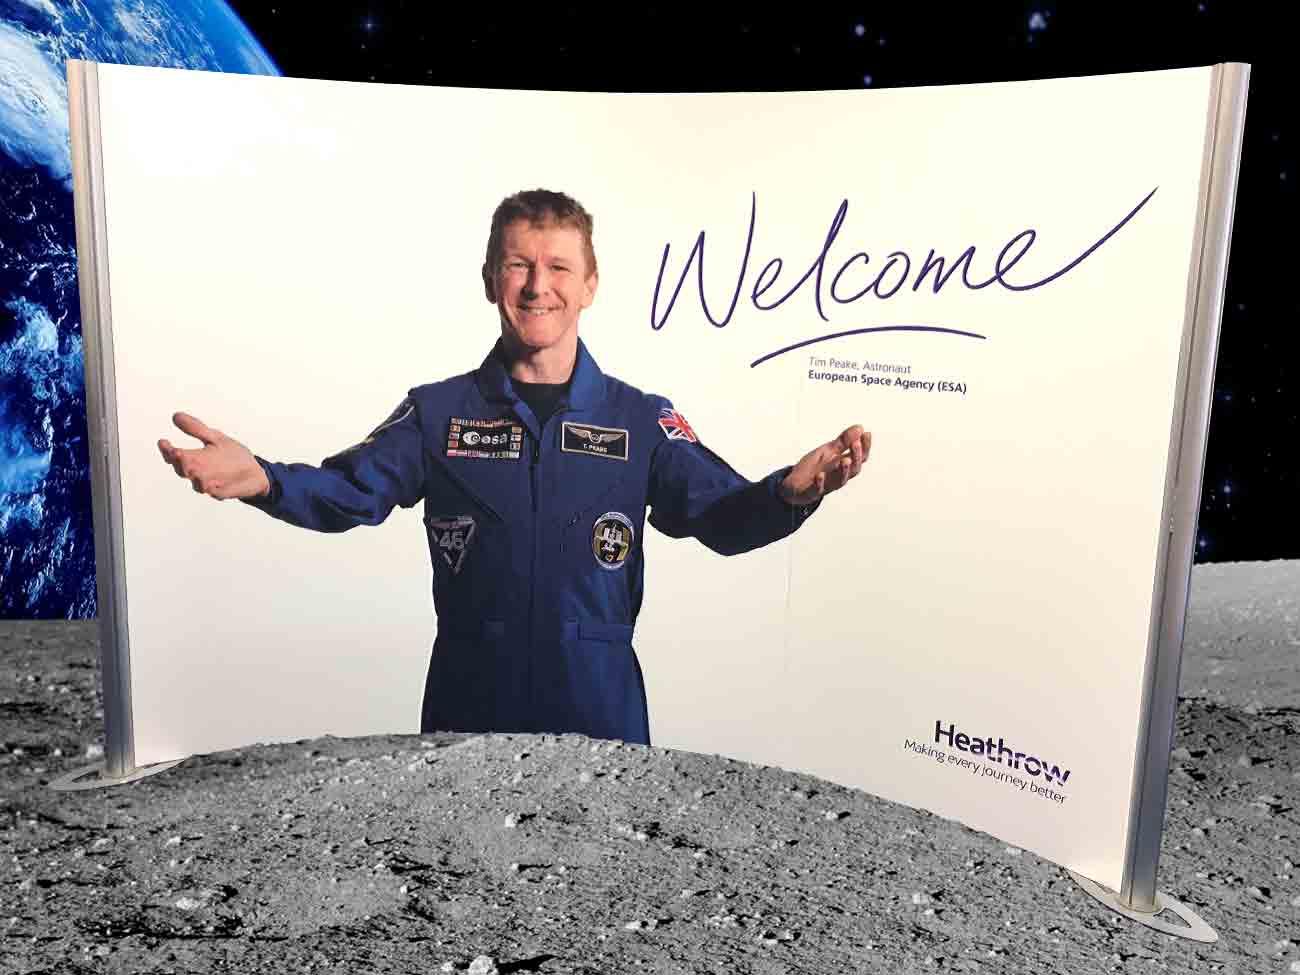 Heathow Welcomes Tim Peake